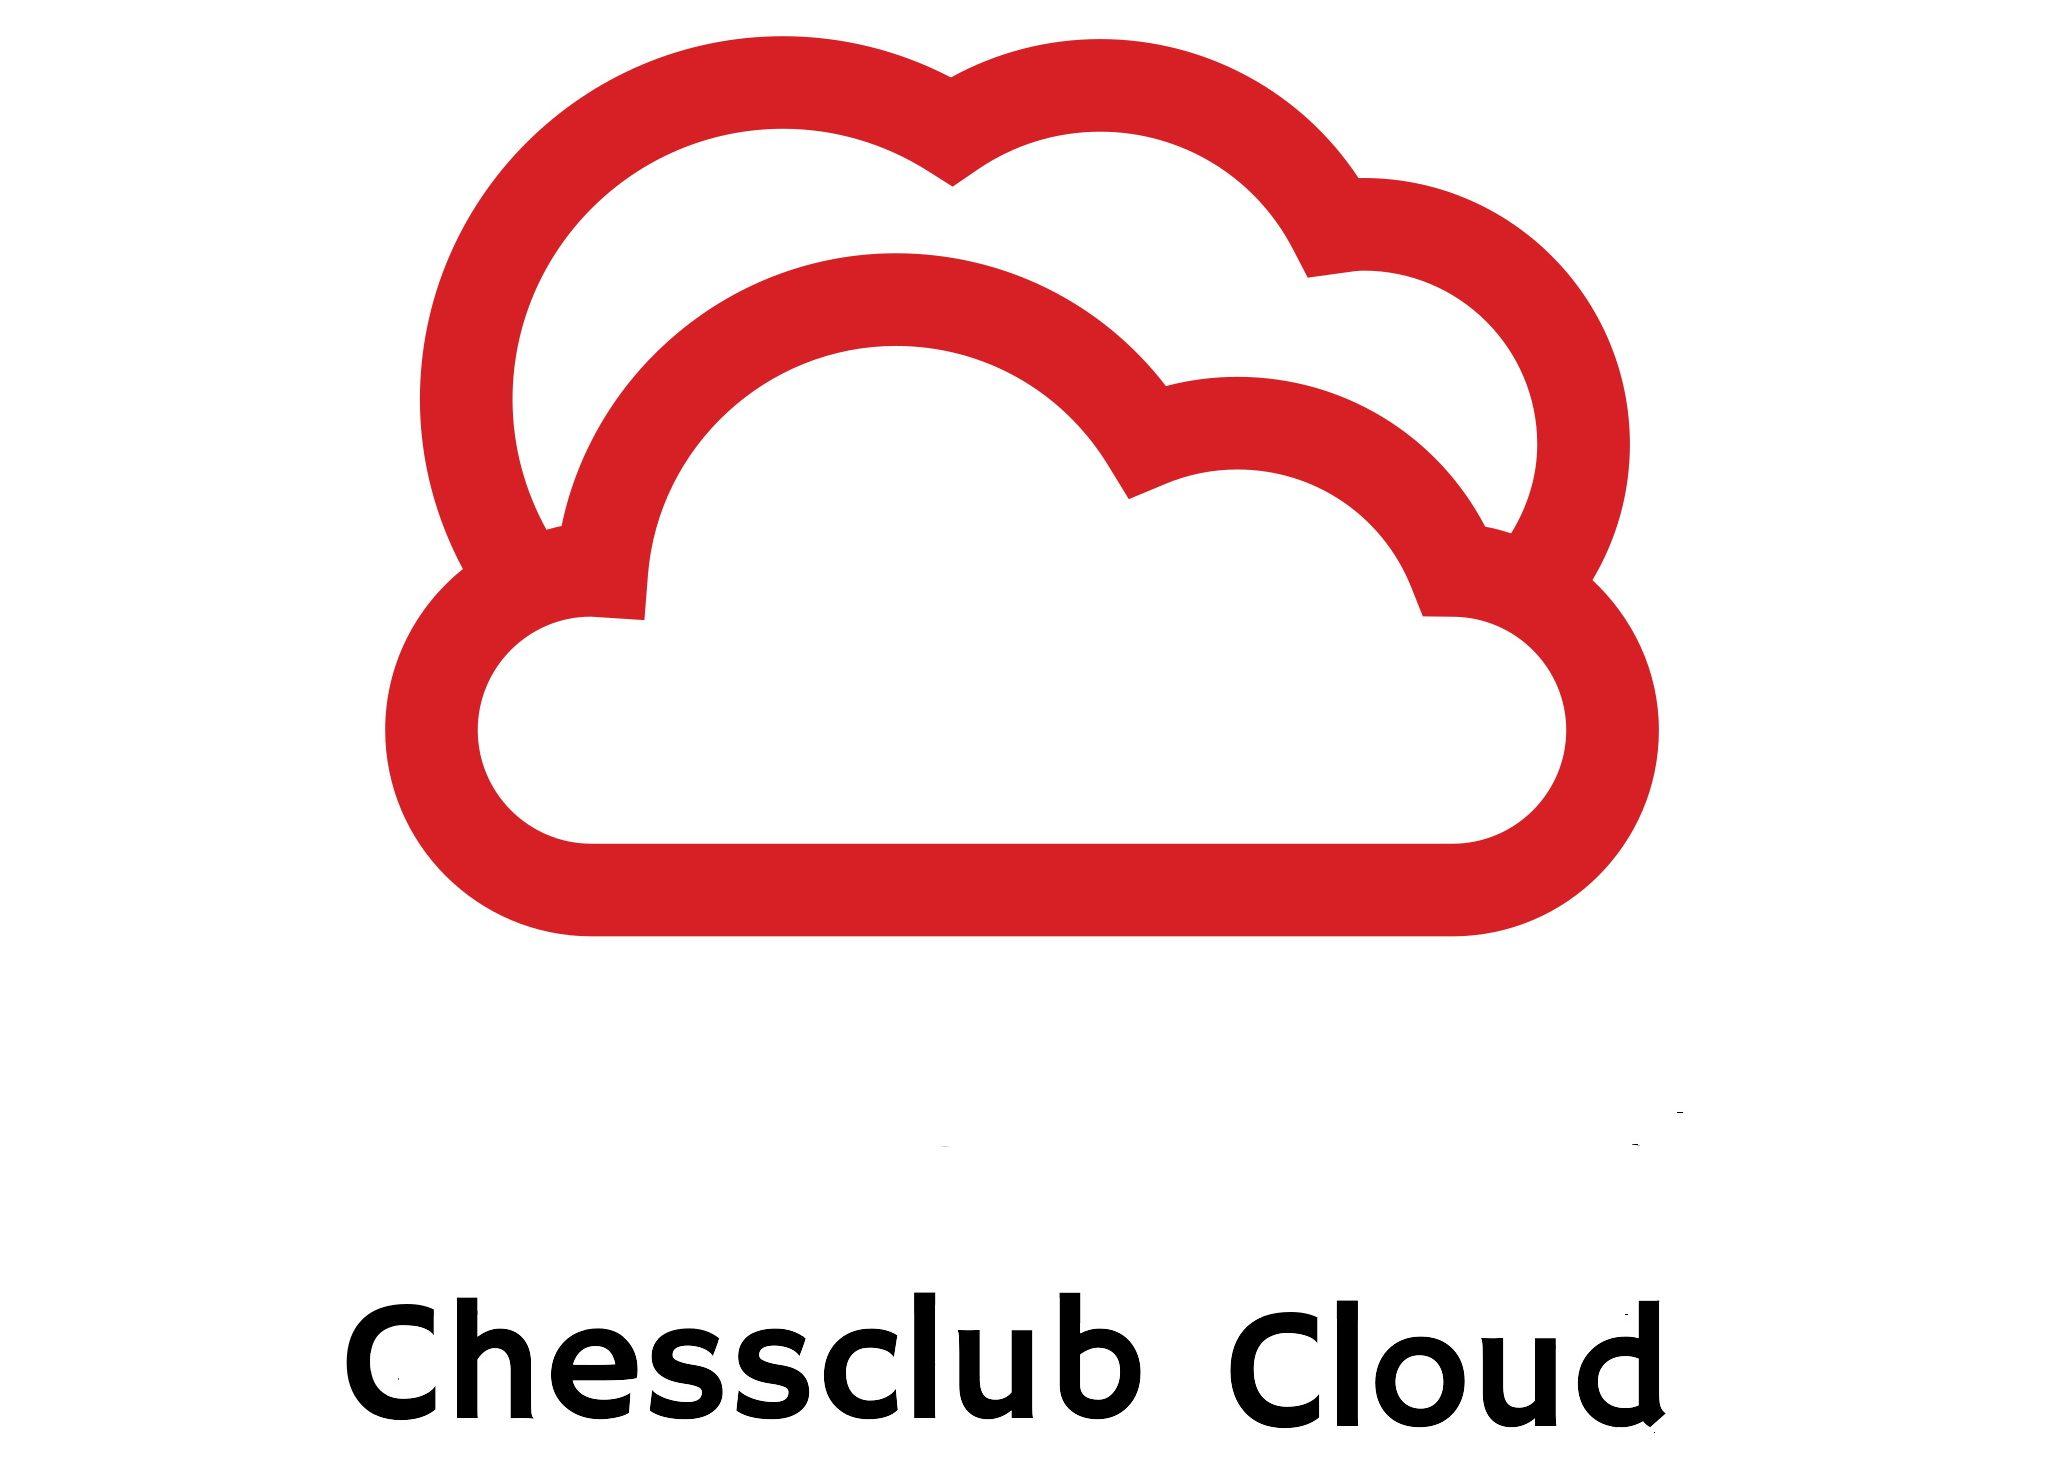 Chessclub Cloud